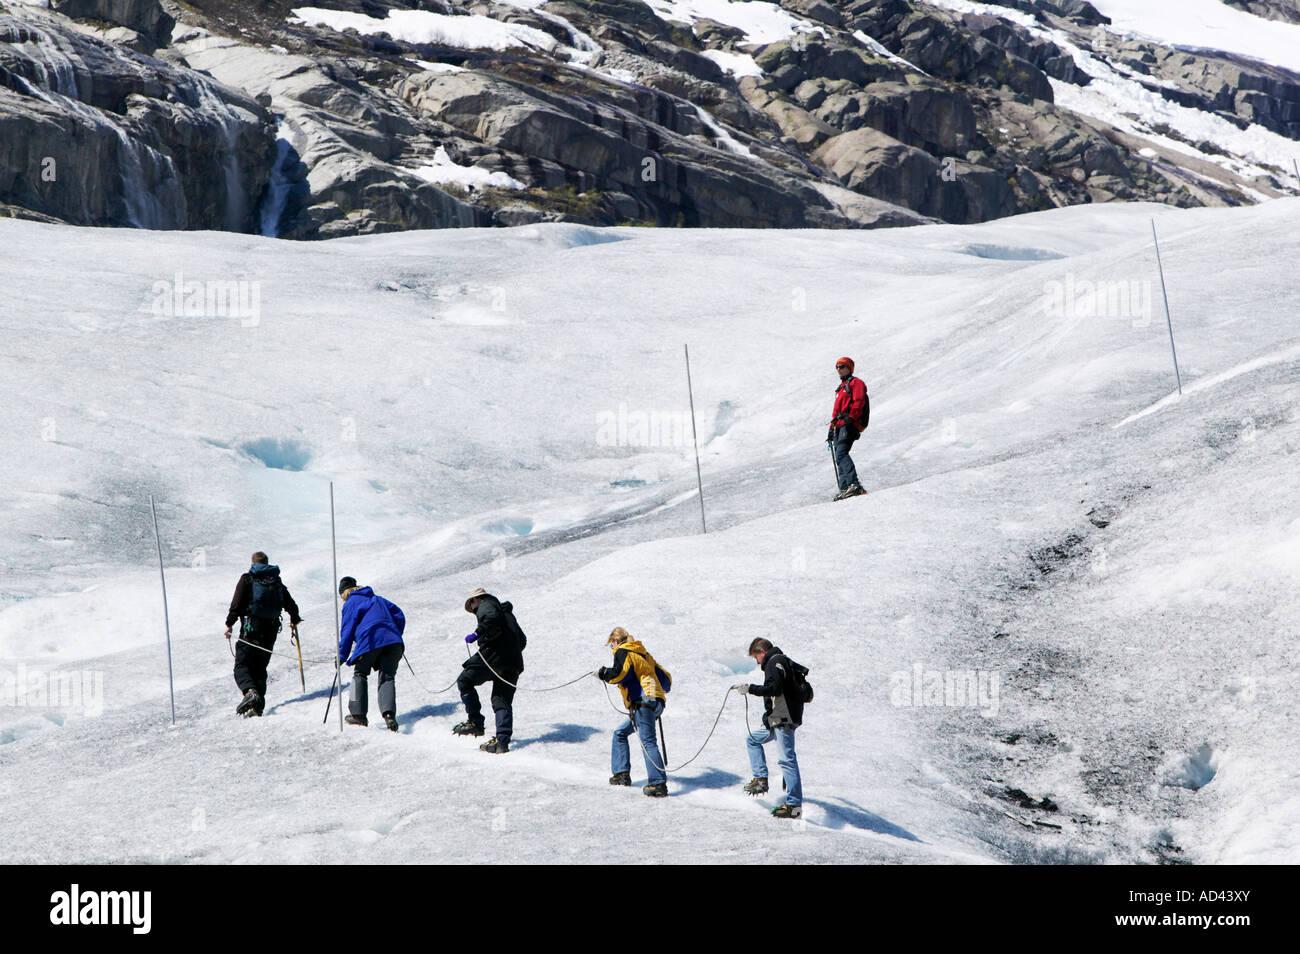 Randonnée guidée sur le glacier Nigardsbreen dans le Parc National de Jostedalsbreen Lustre Sogn og Fjordane Norvège Banque D'Images